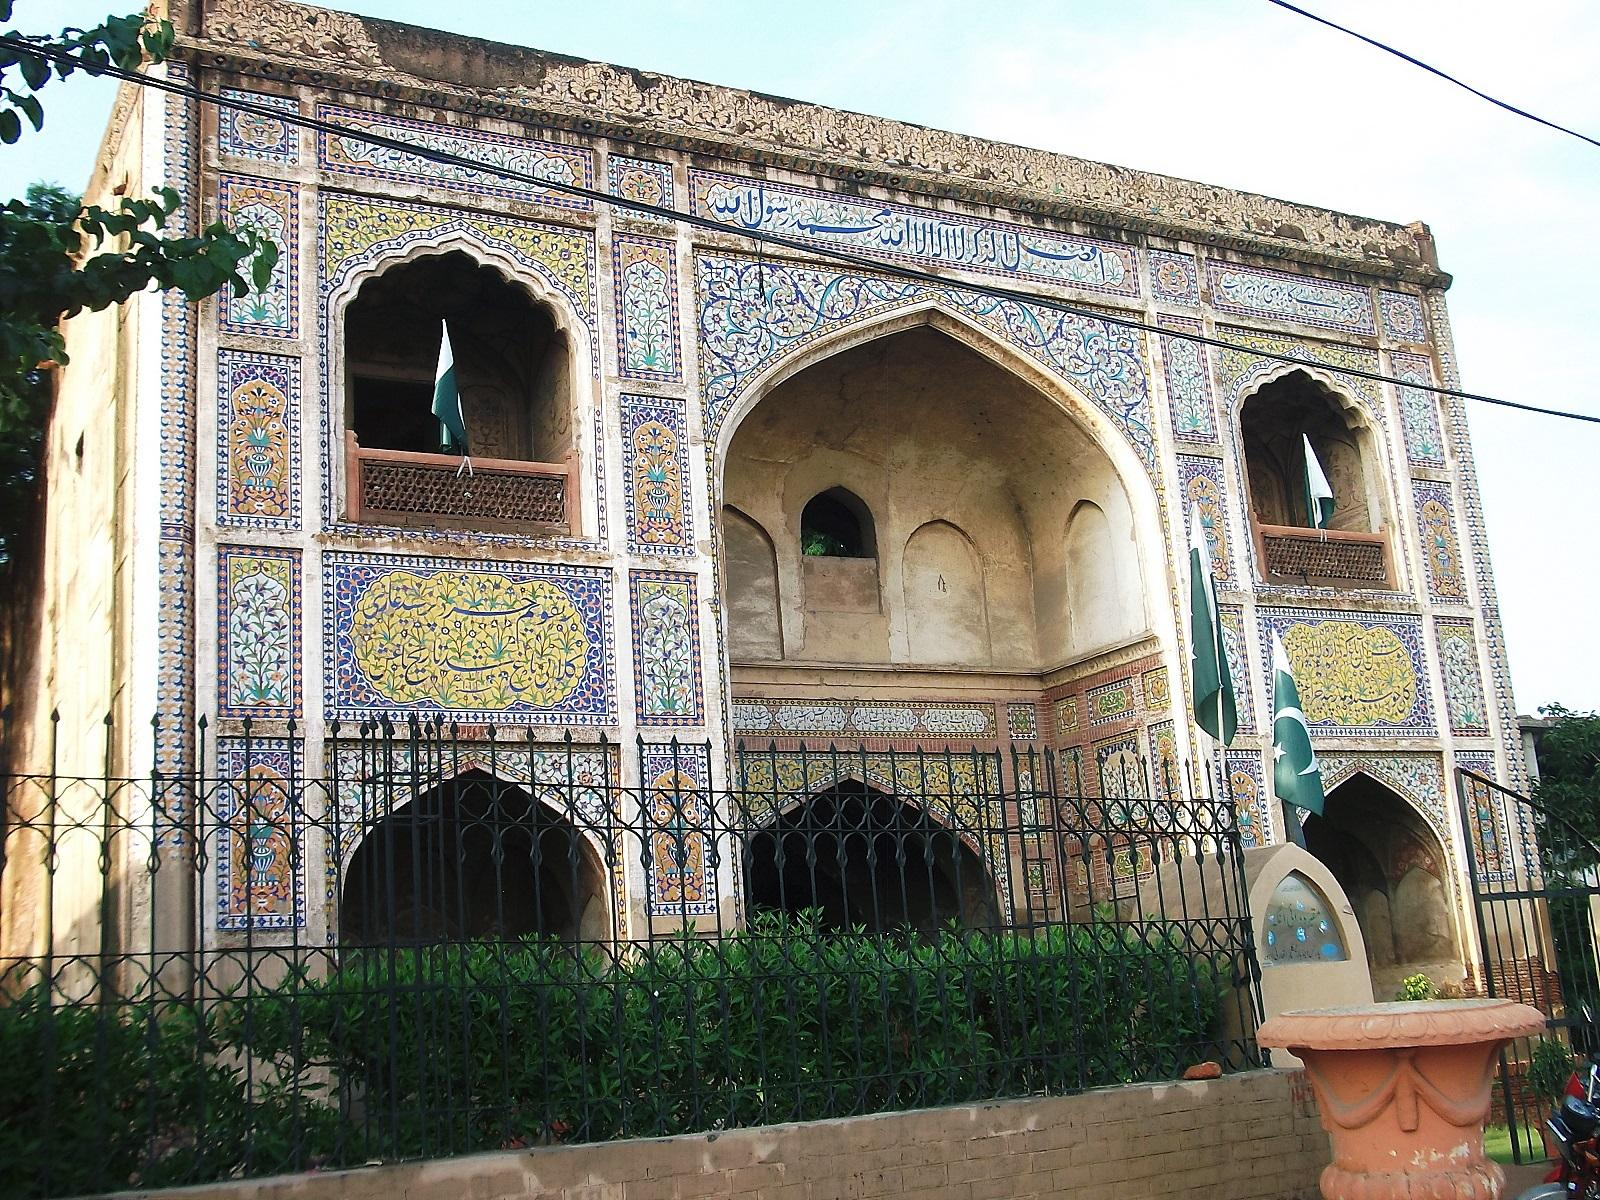 File:Gulabi Bagh Gateway, Lahore.JPG - Wikipedia